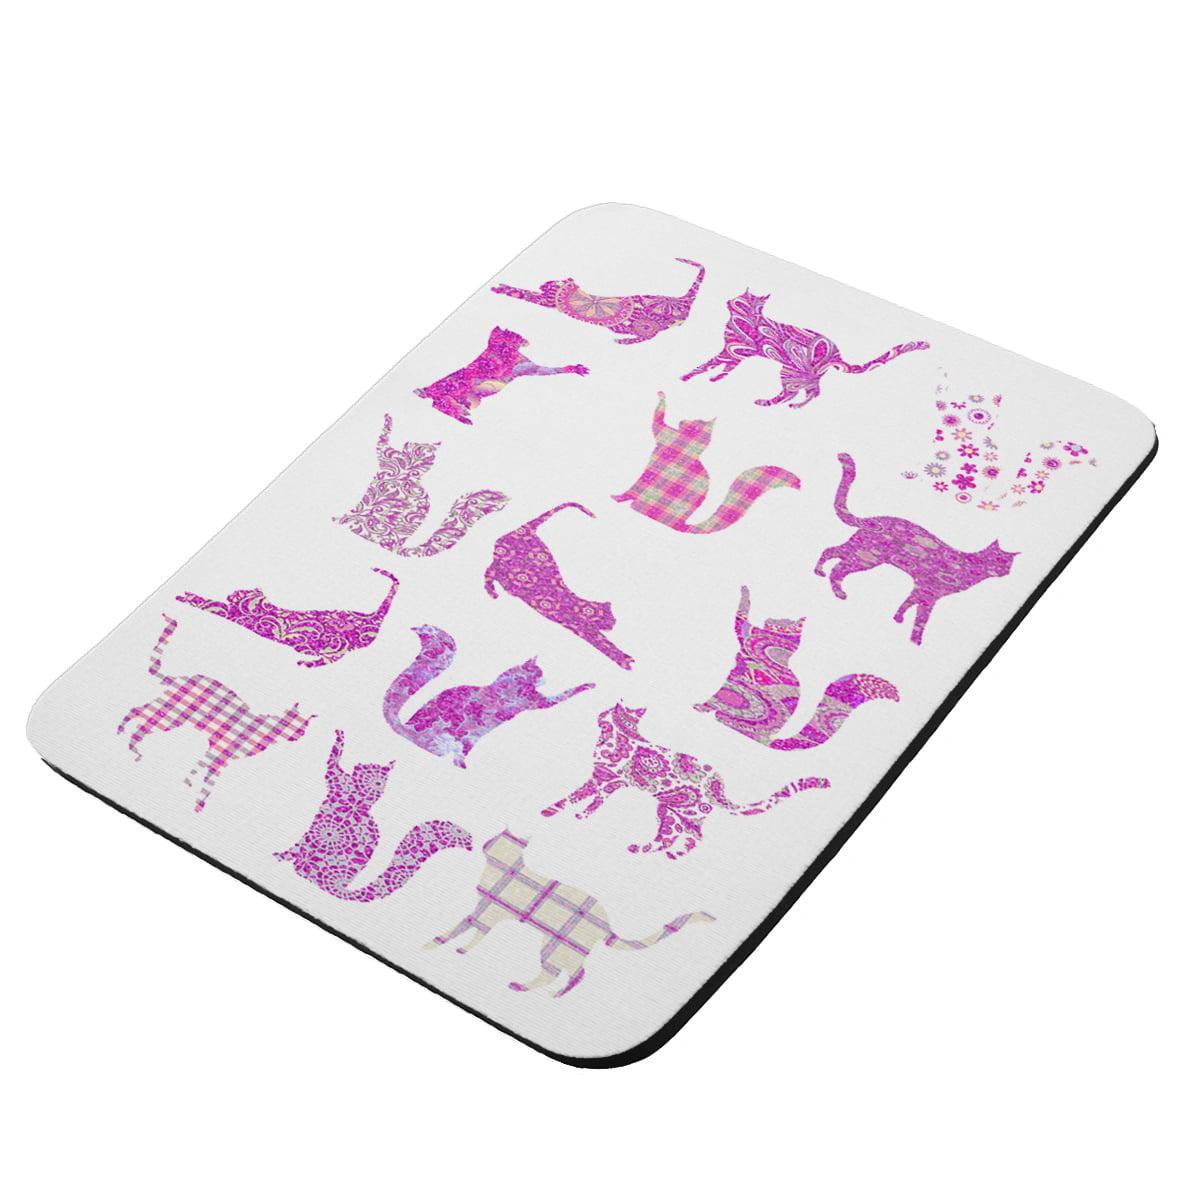 Kitty Cat Pink - KuzmarK Mousepad / Hot Pad / Trivet